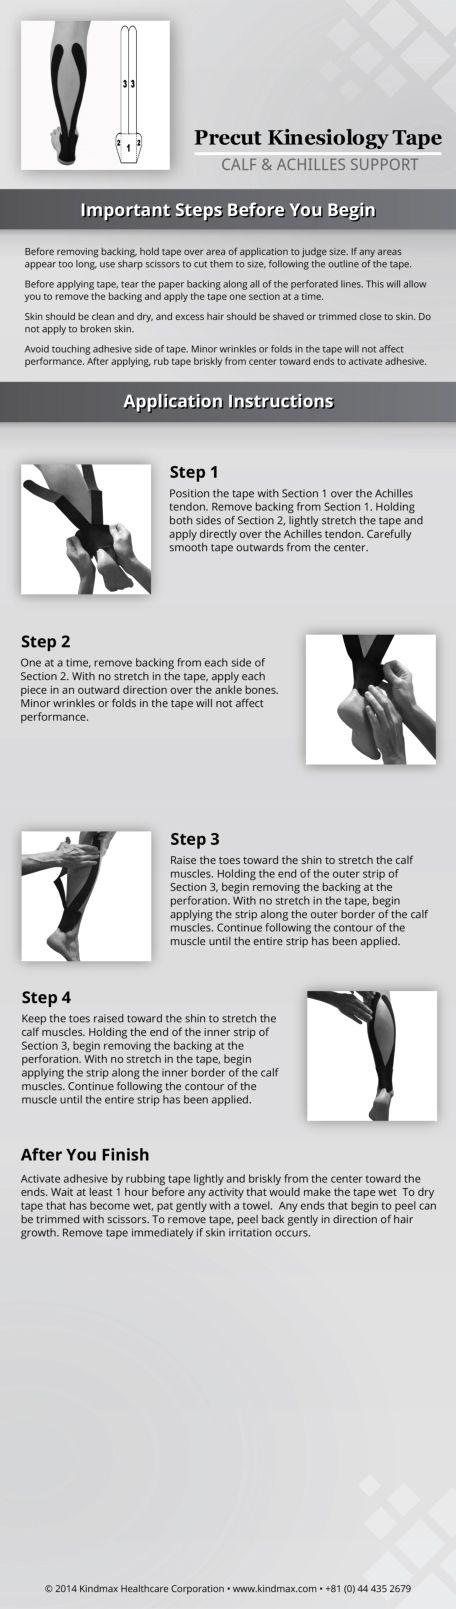 Calf achilles support application instructions #HowToTape #EasyToTape